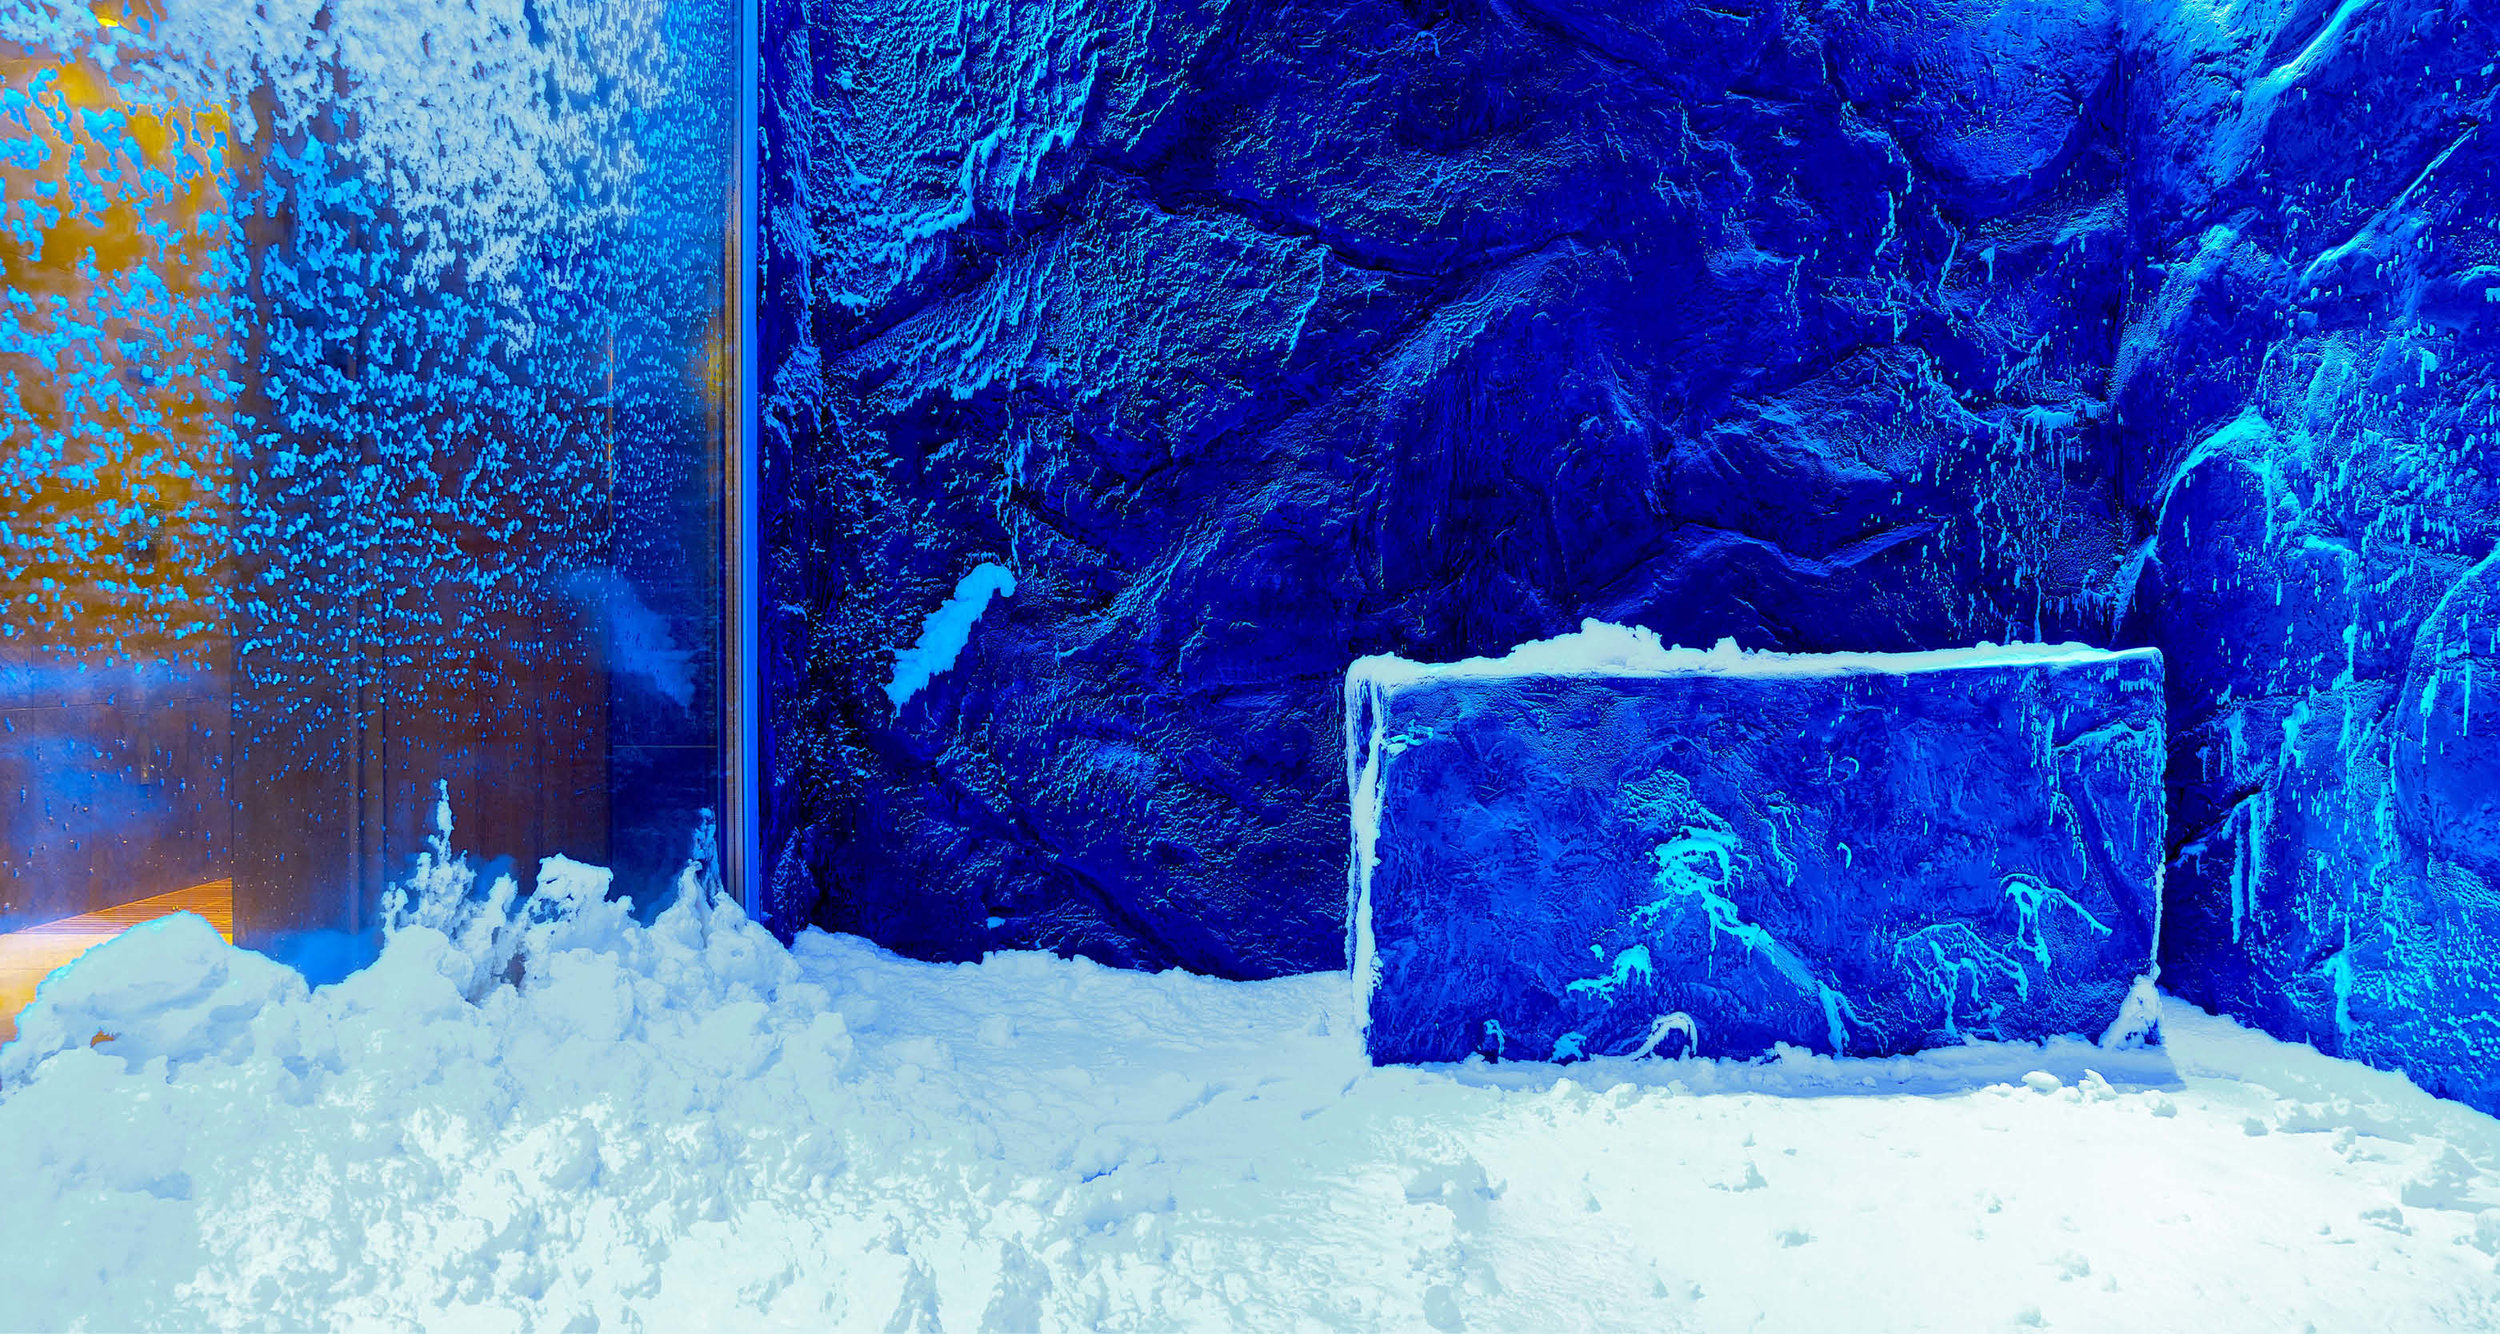 Dream-Maker-Travel-Ship-Viking-Sky-Snow-Grotto.jpg